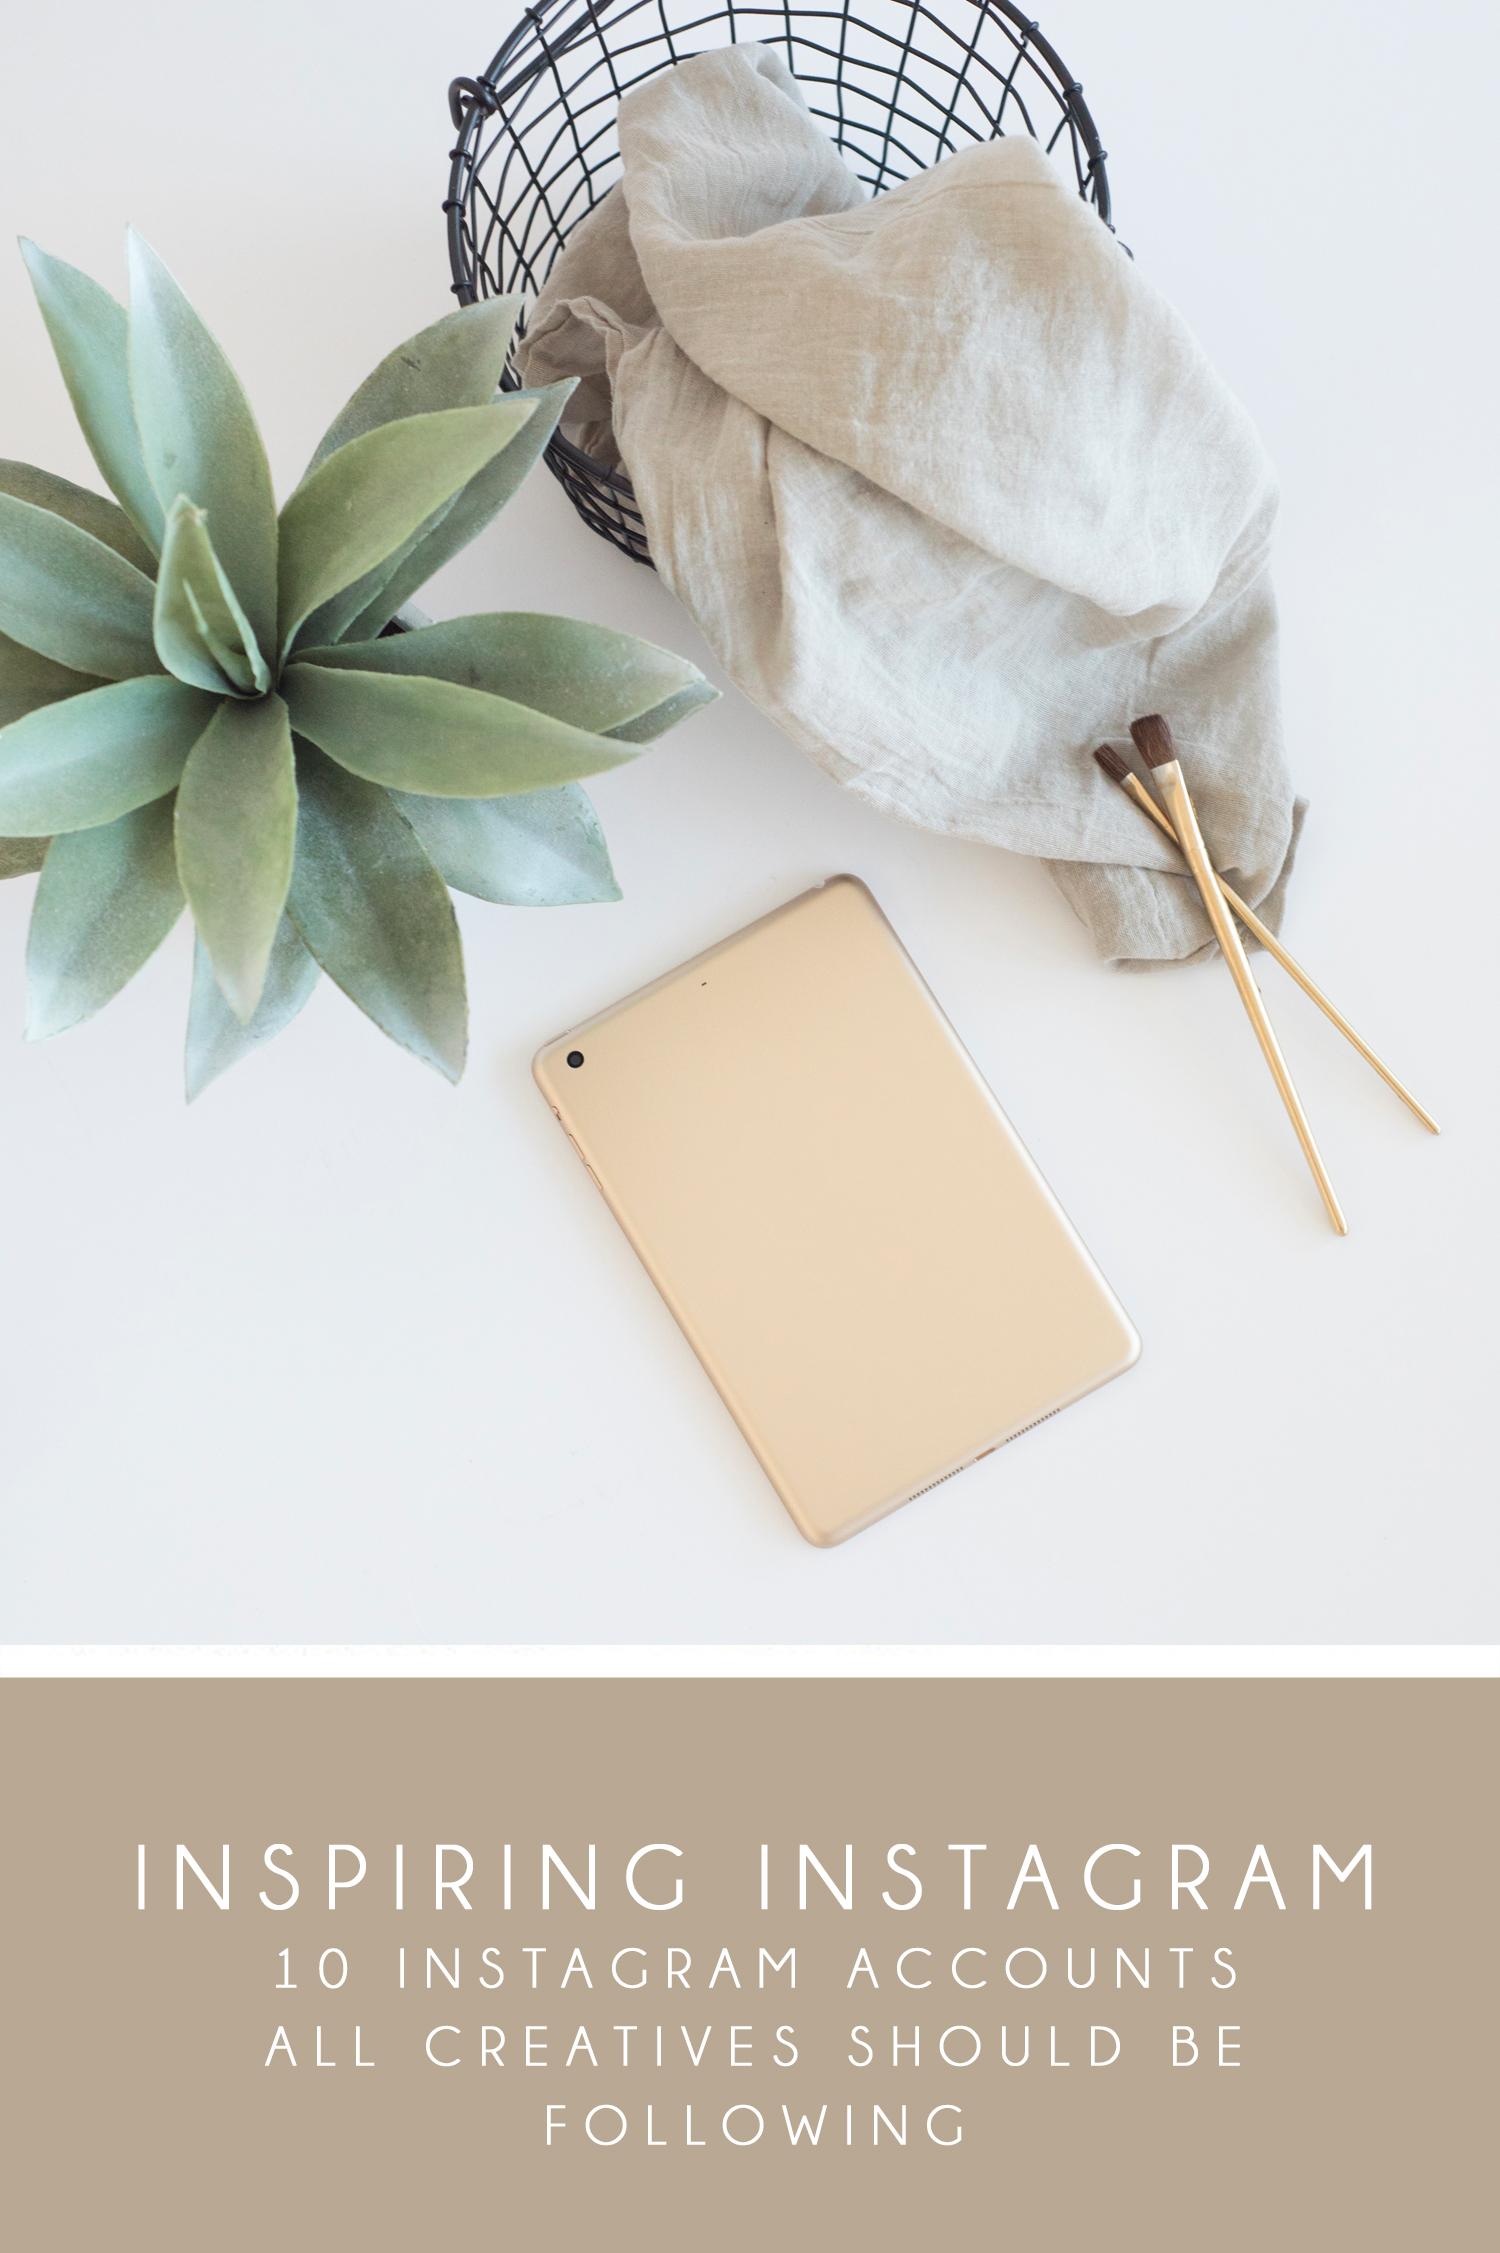 10 Inspirational Instagram Accounts to Follow | Aceti Design Co.